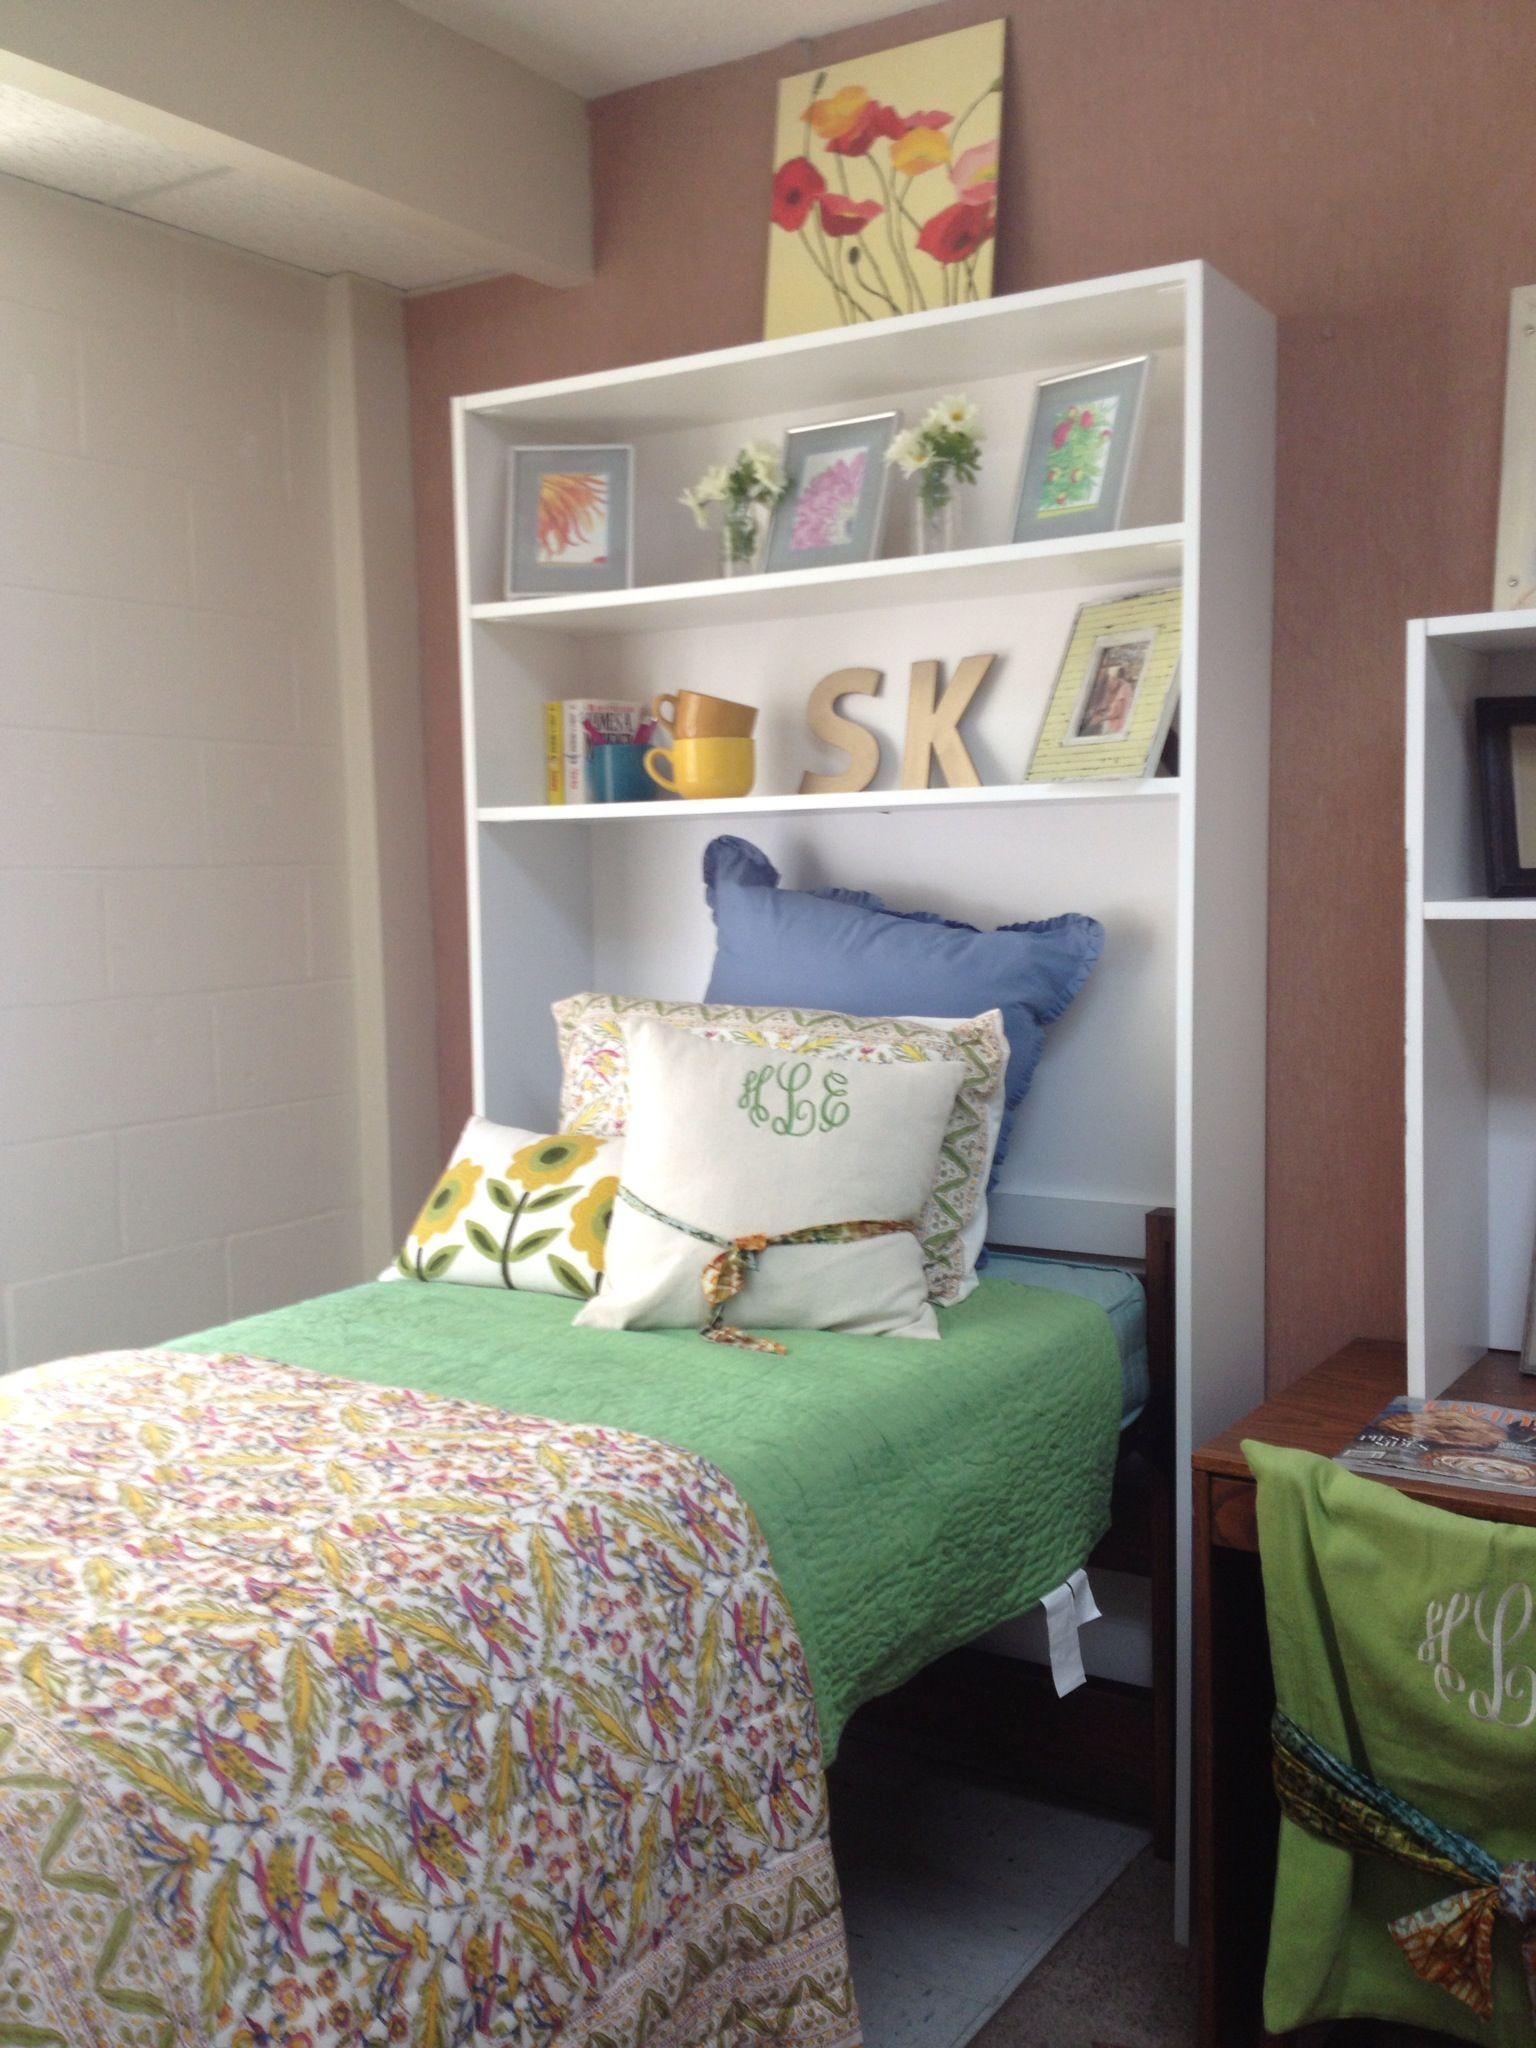 Use a bookshelf as a headboard just